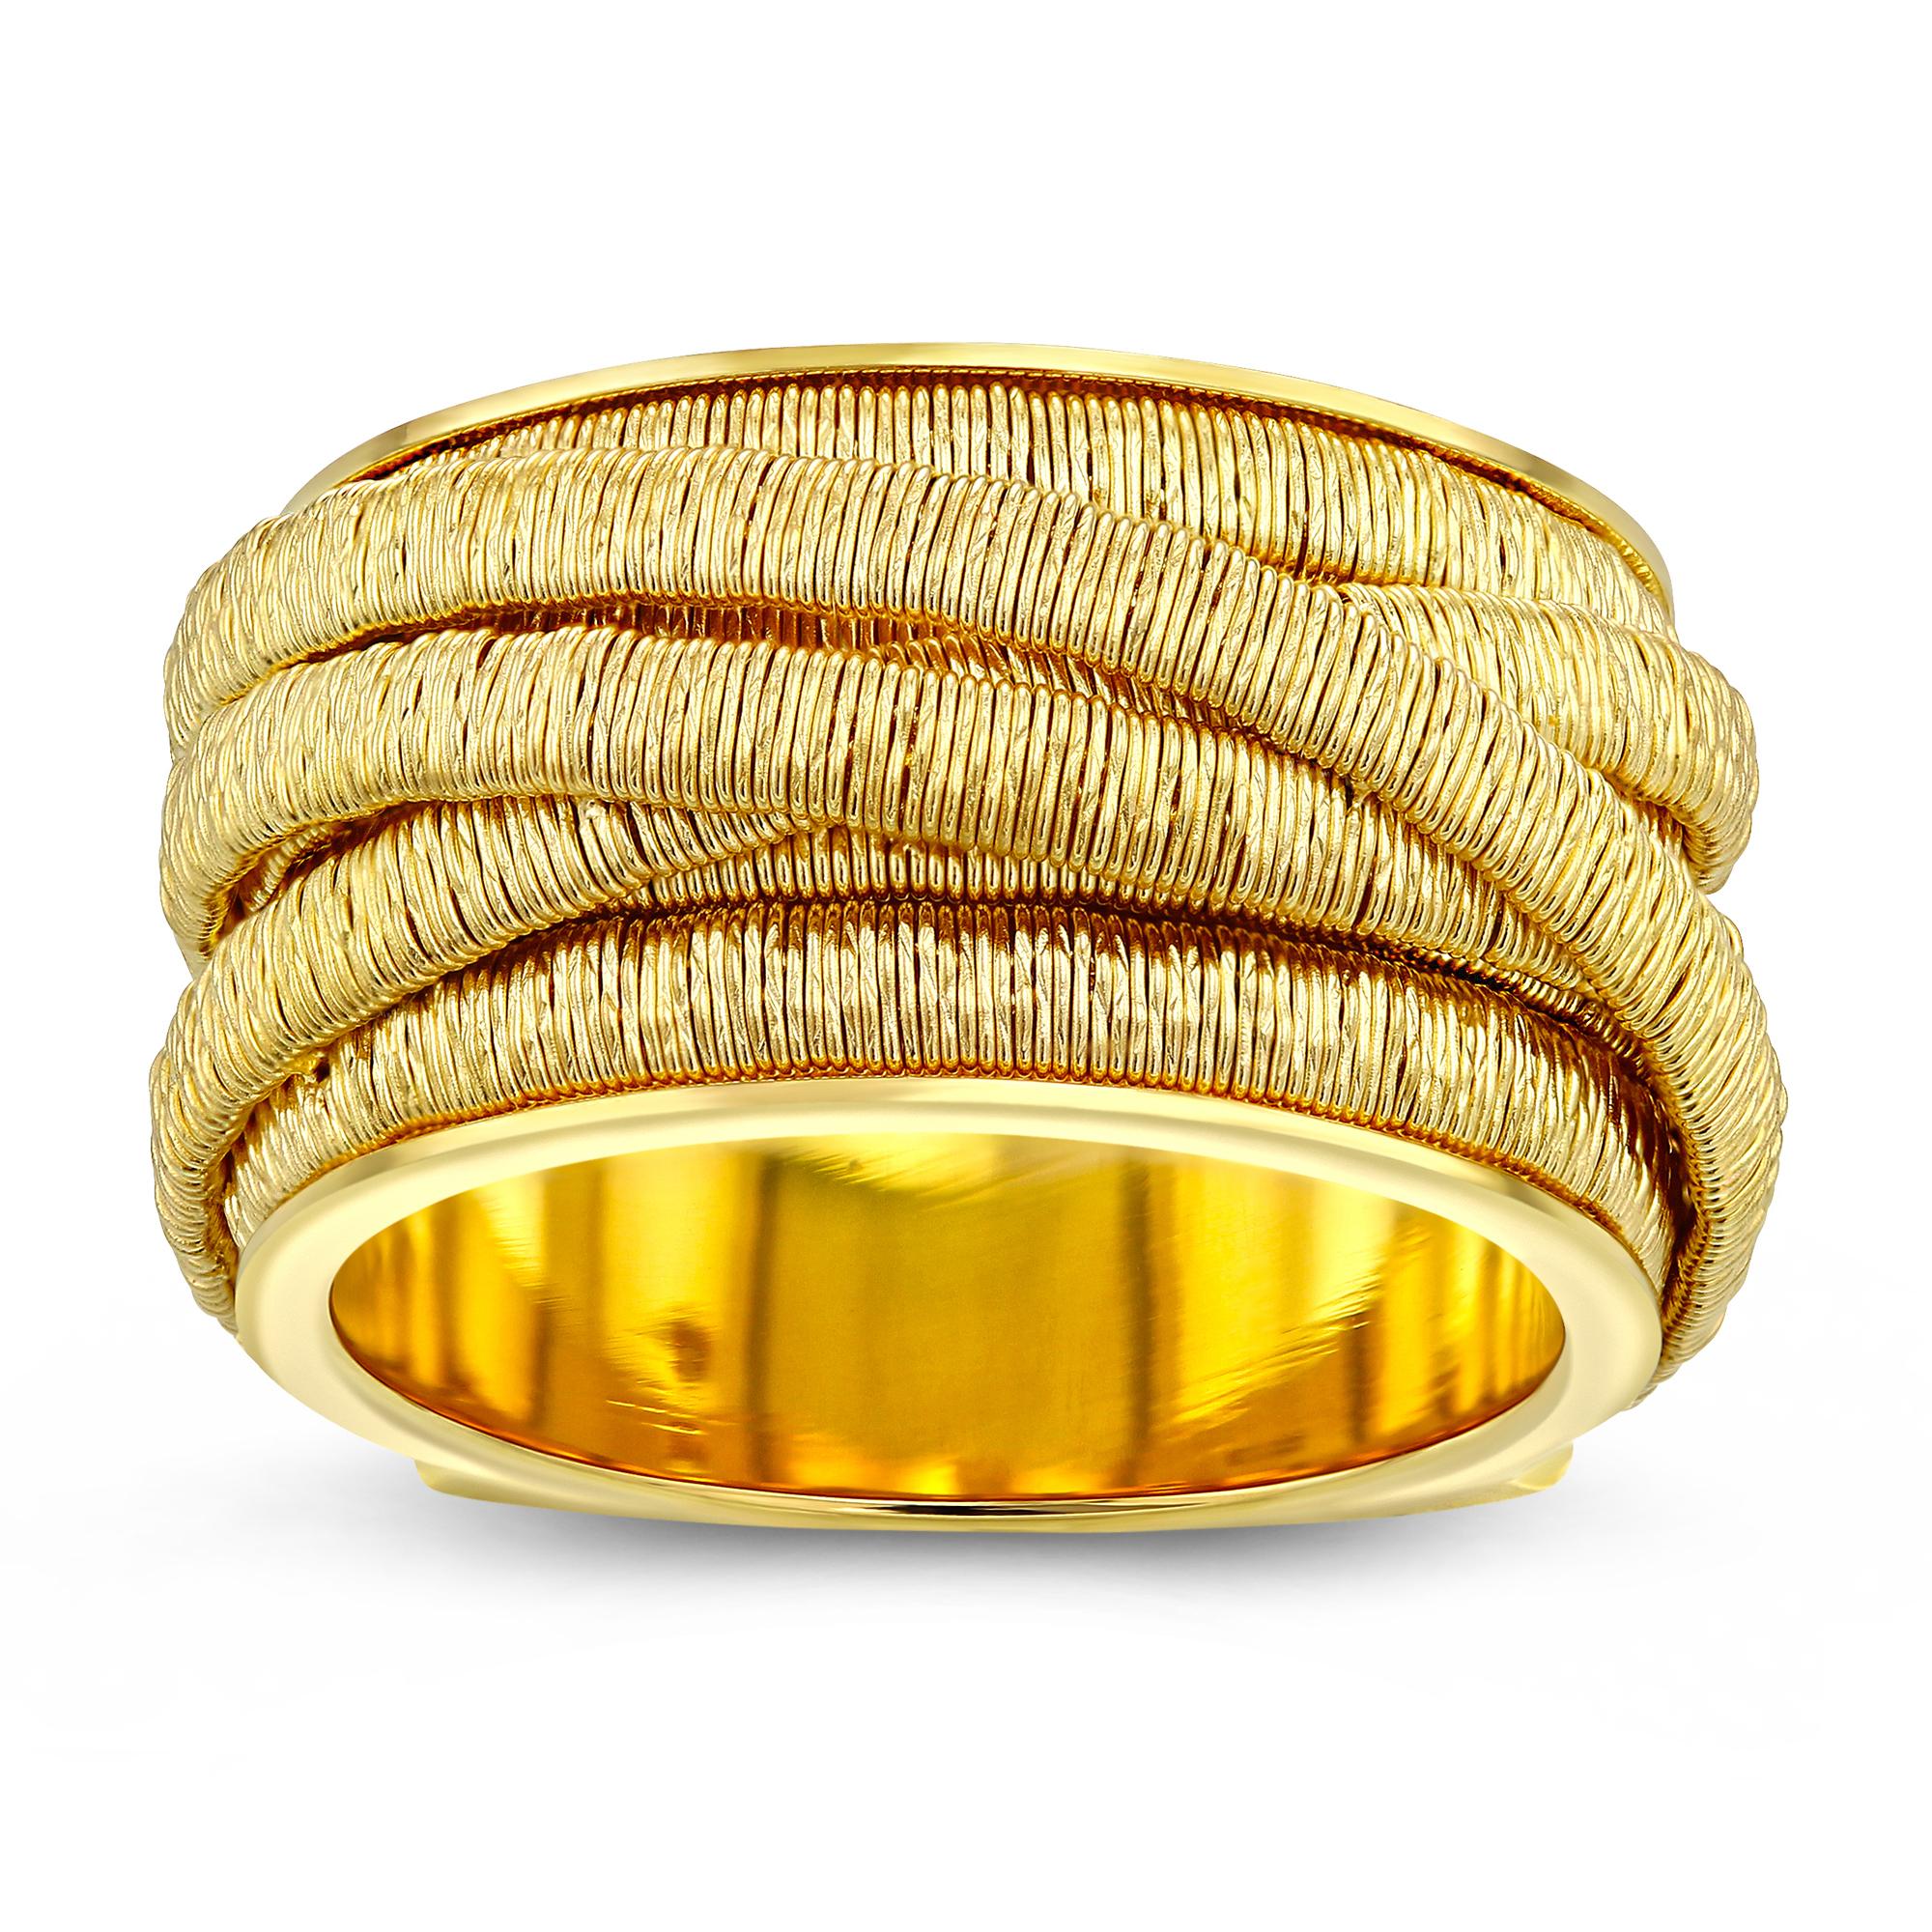 Marco Bicego 18K Yellow Gold Il Cairo Ring   Borsheims